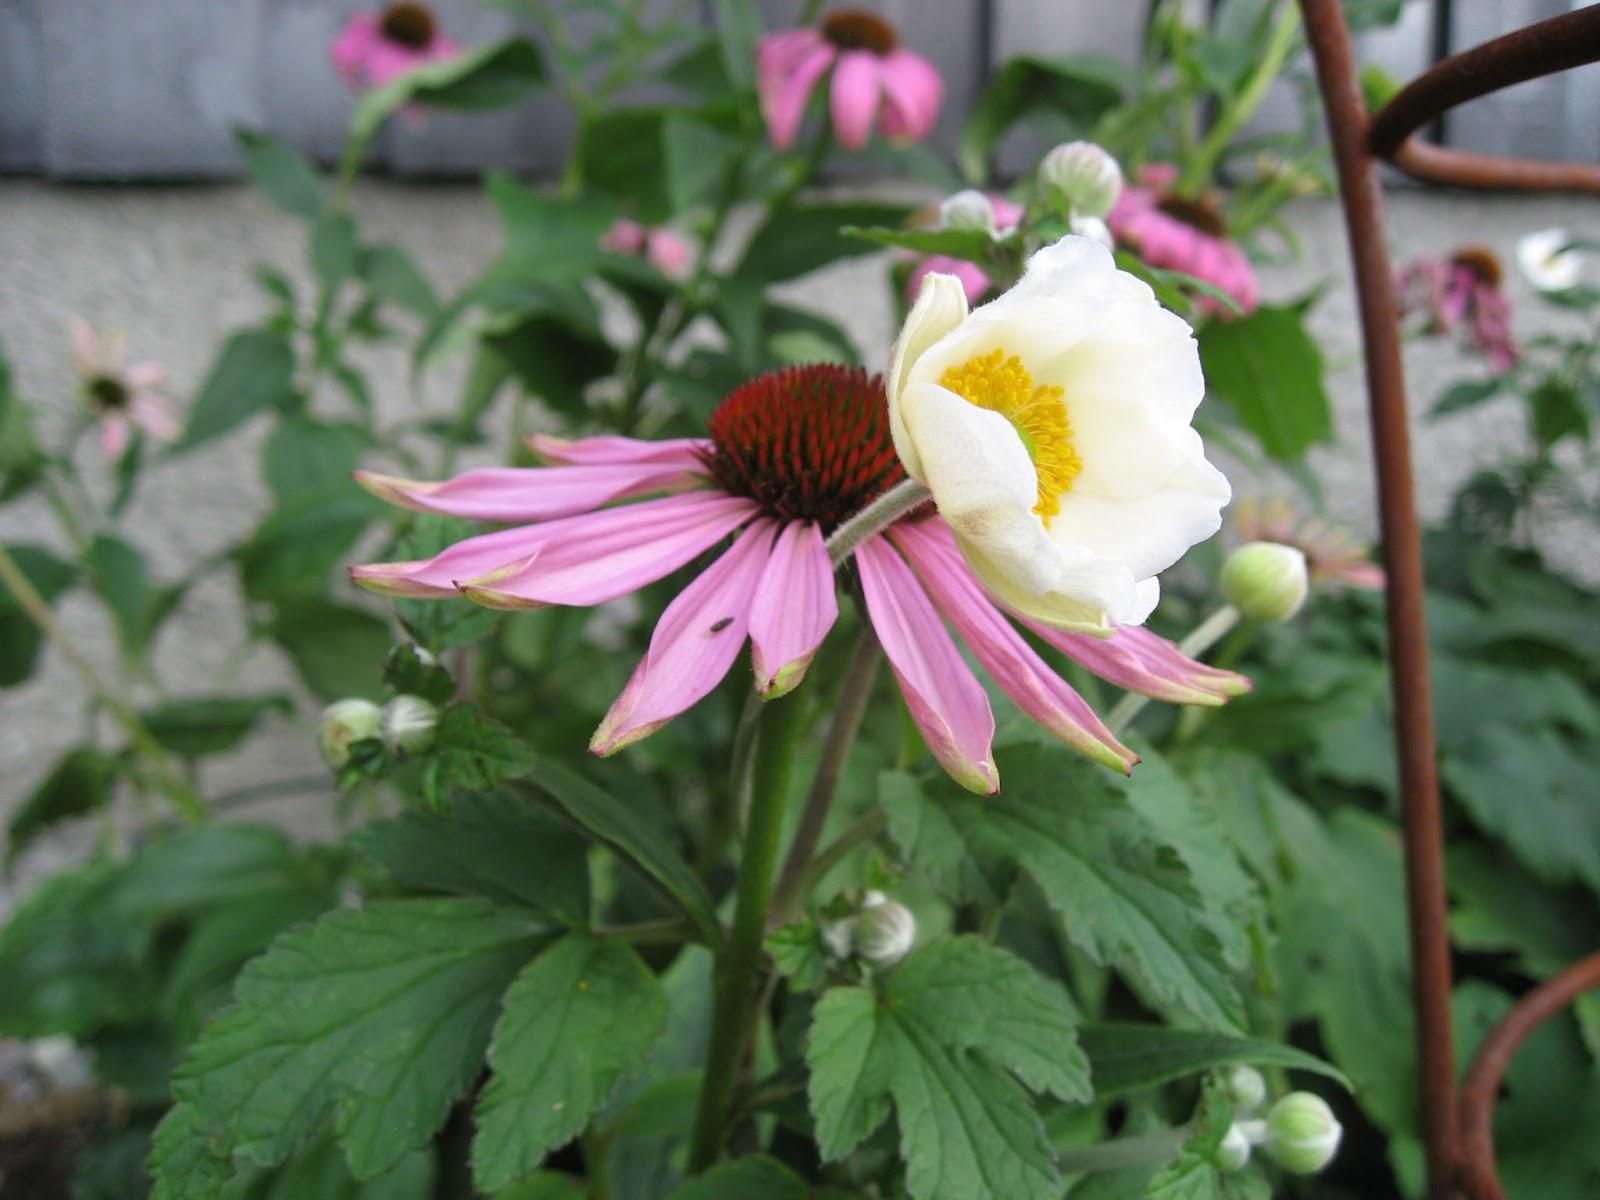 herlig hvit og rosa purpursolhatt echinacea i flere stadier. Black Bedroom Furniture Sets. Home Design Ideas